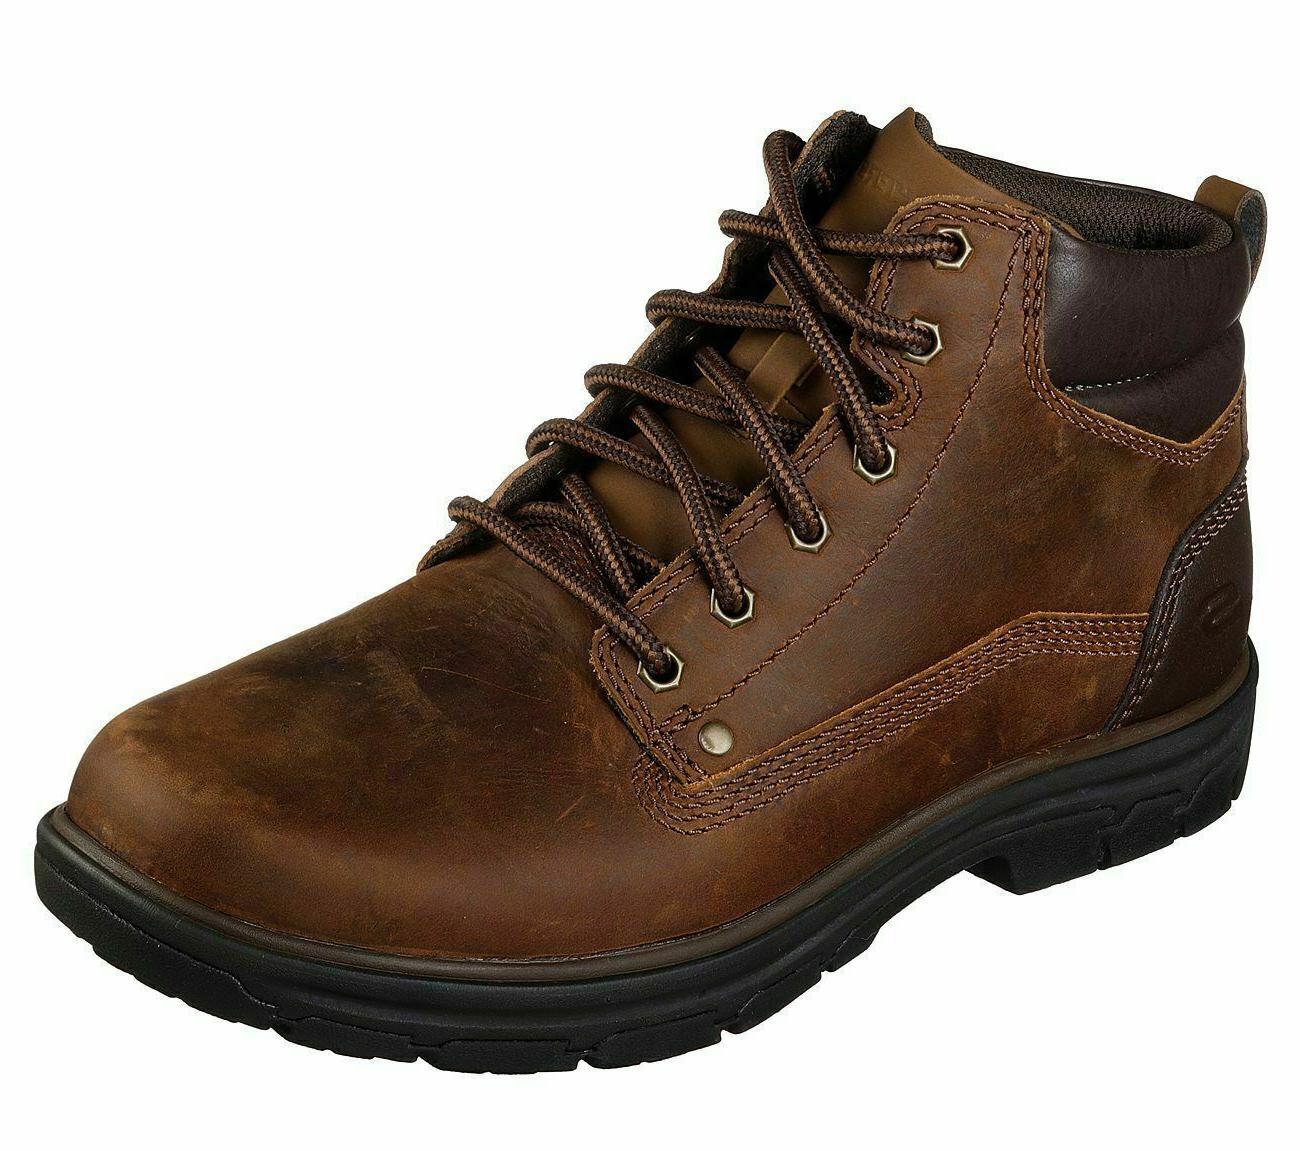 Skechers Men's Segment Garnet    Boots     NIB